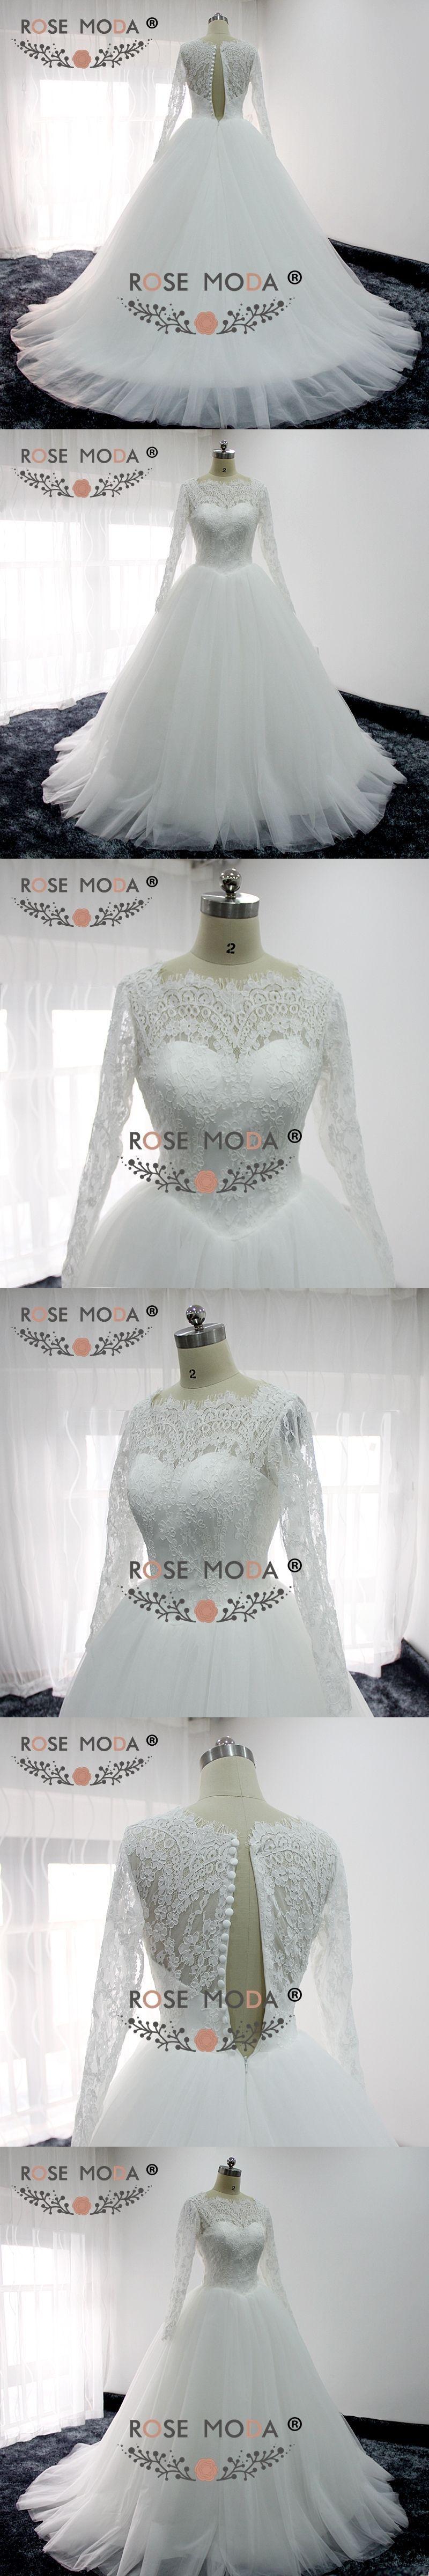 White puffy wedding dresses  Rose Moda High Neck Long Sleeves Puffy Wedding Dress Lace Top